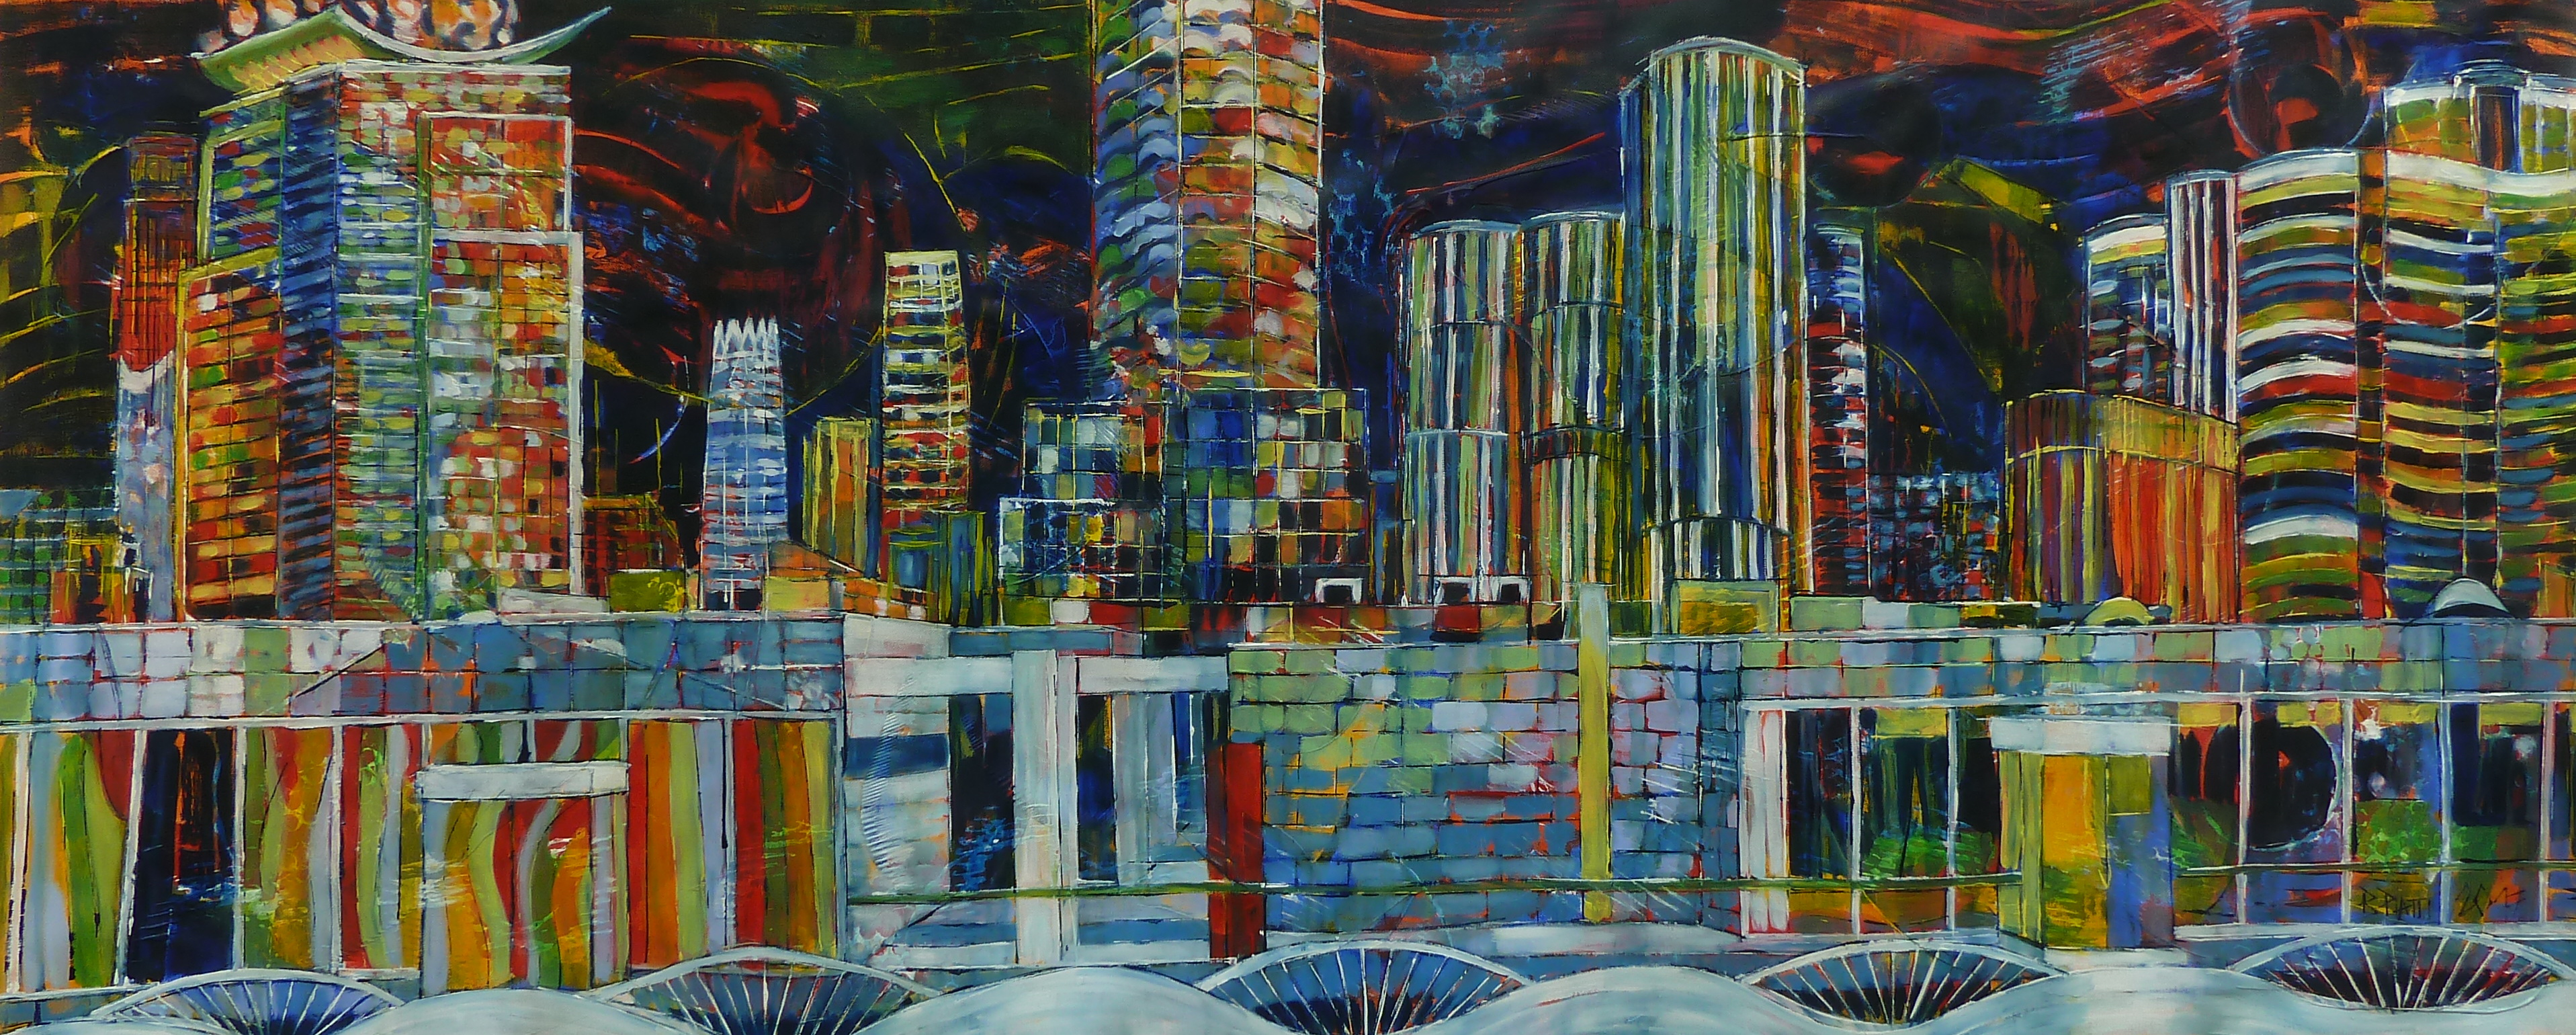 Soho's Intensity Beijing 2017, huile sur toile 60 x 150 cm